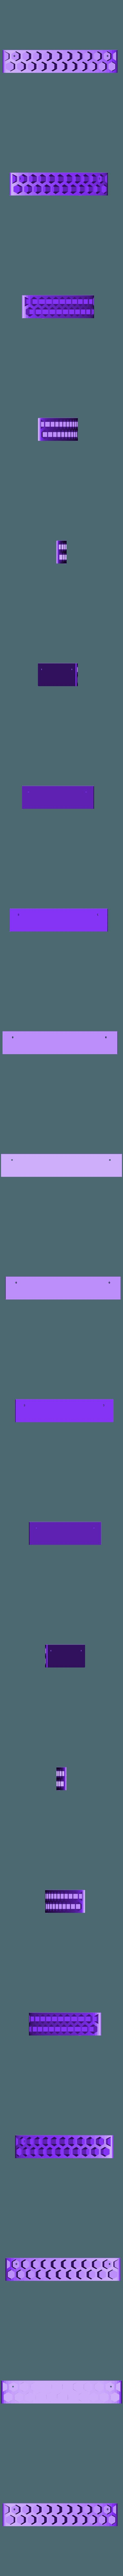 base.stl Download free STL file porte-carte et porte-clé • 3D printing object, phikal